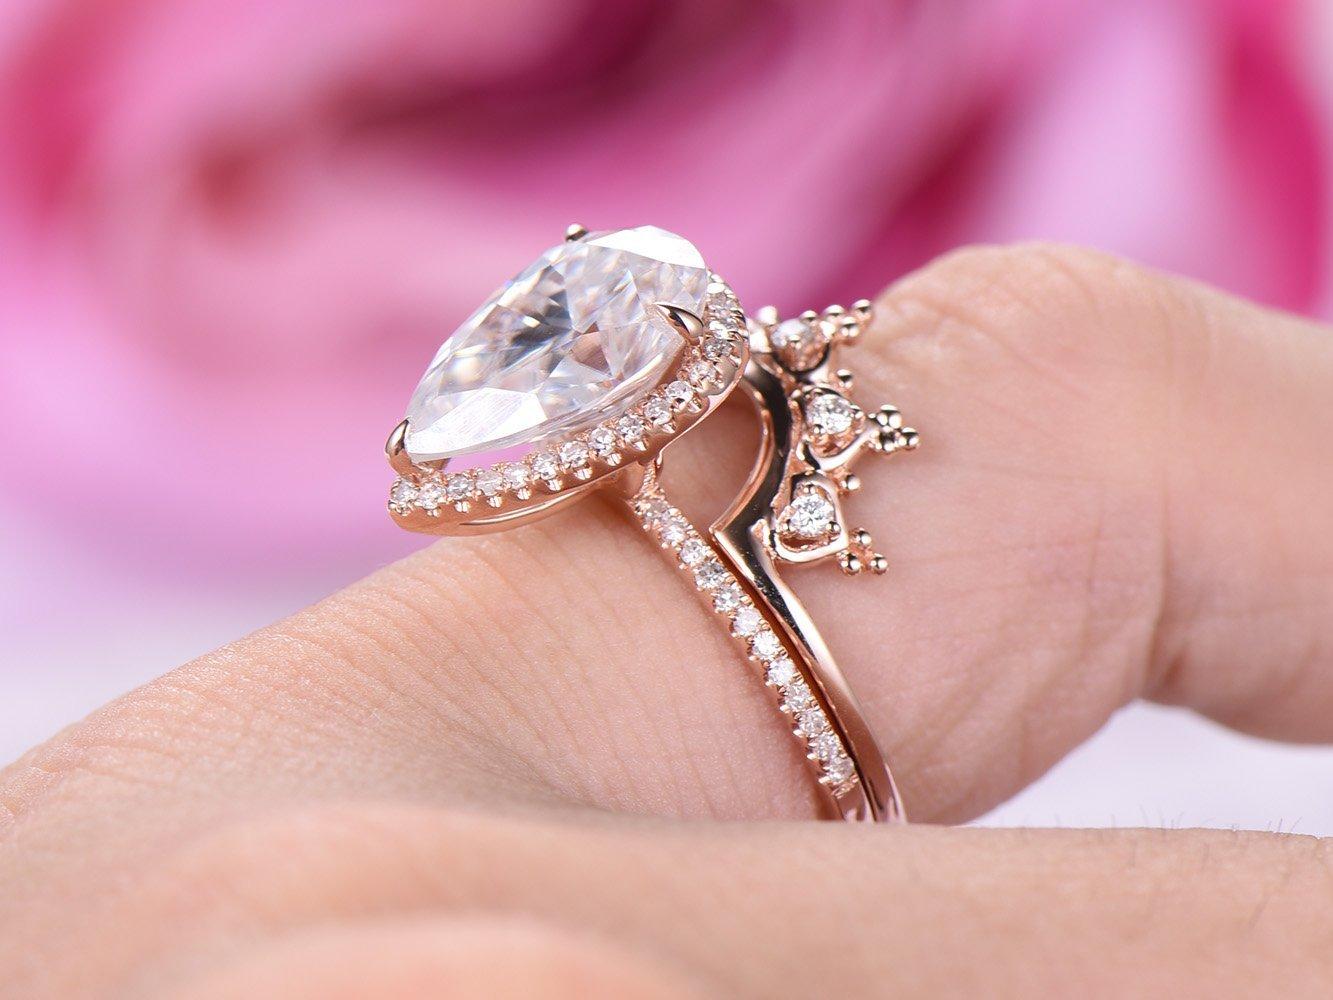 Amazon.com: Pear Moissanite Engagement Ring Set Tiara Wedding Band ...